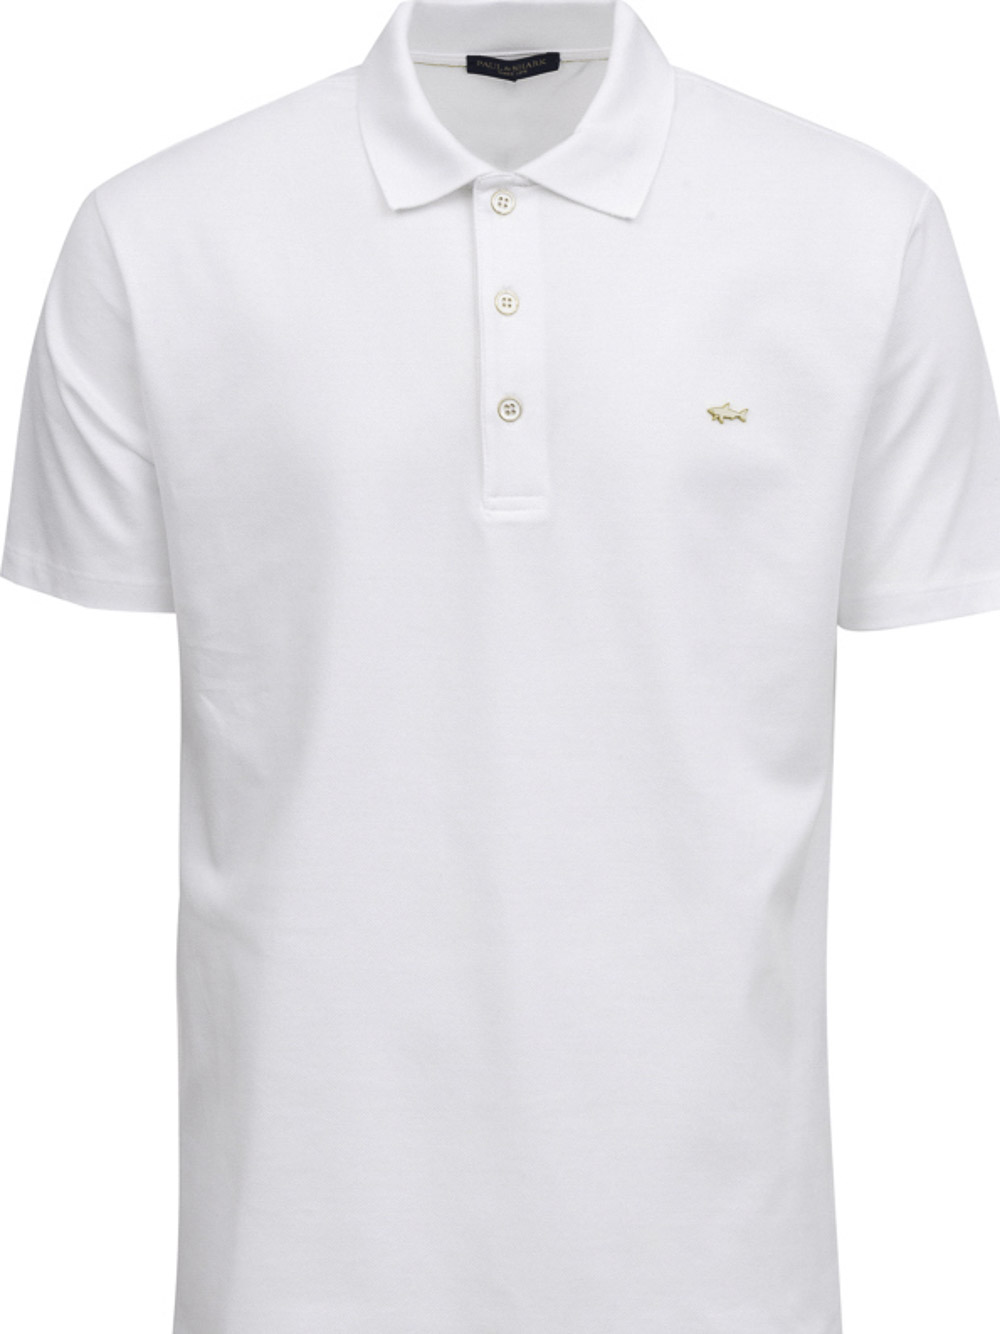 PAUL & SHARK Μπλούζα Polo 21411245-010 ΛΕΥΚΟ